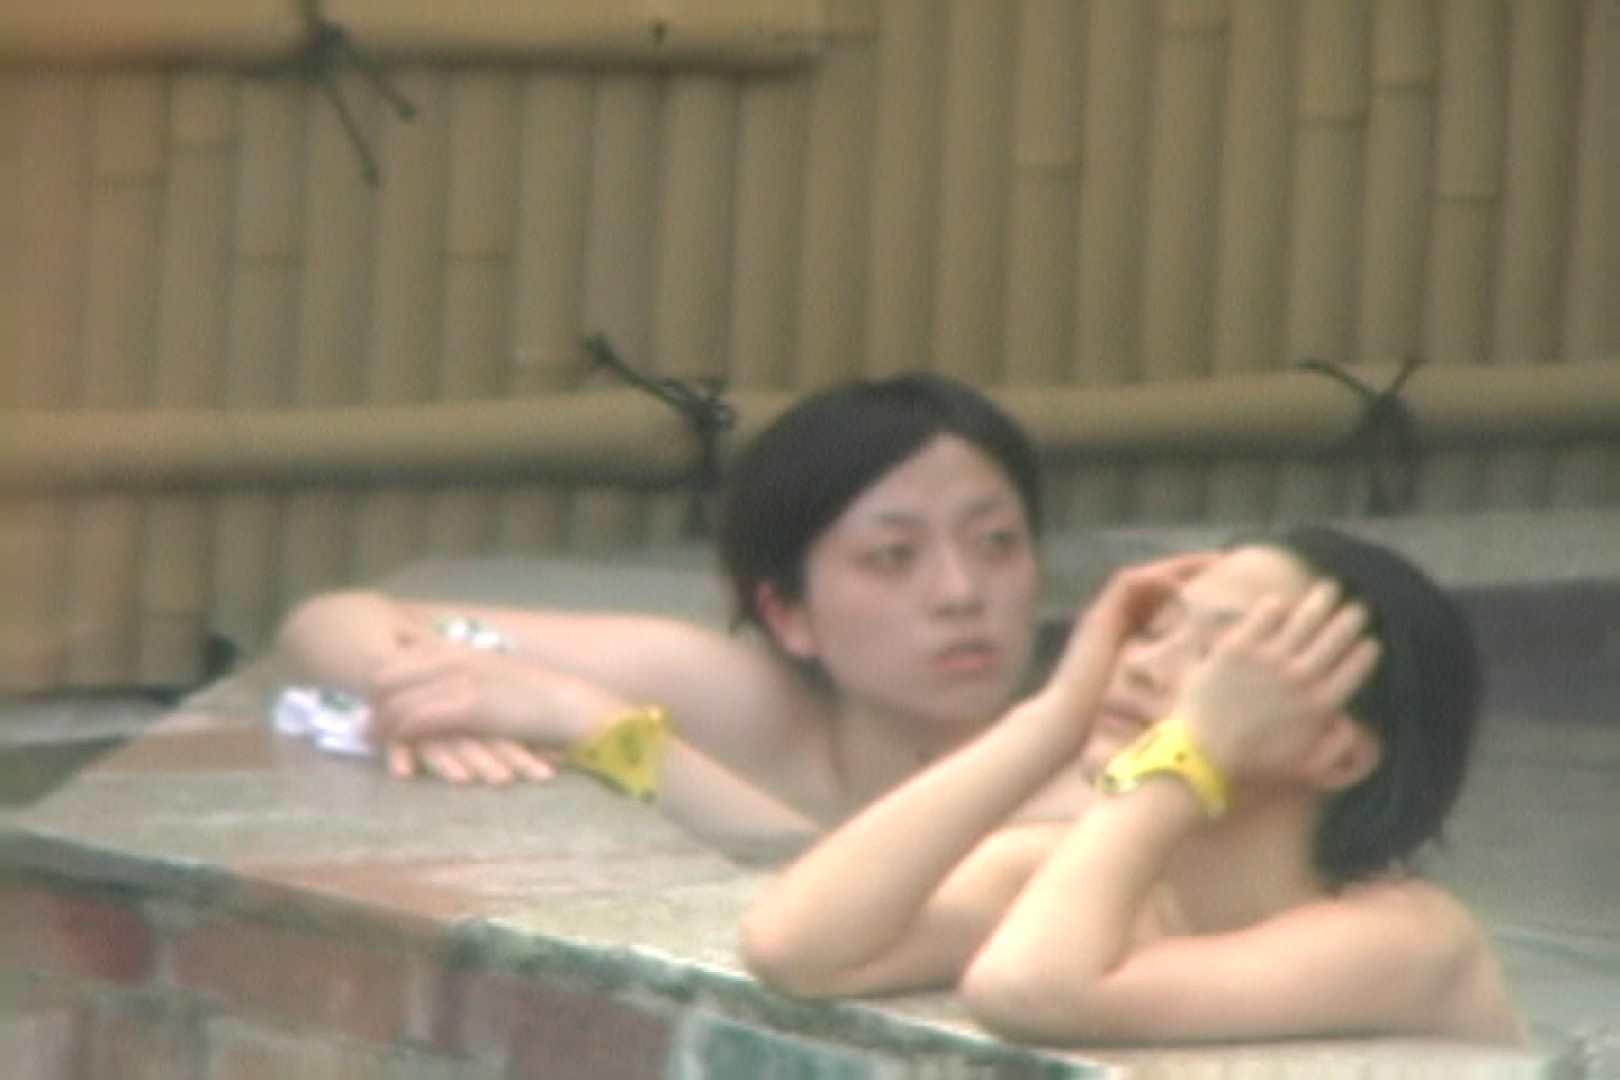 Aquaな露天風呂Vol.562 露天 AV無料動画キャプチャ 109画像 35